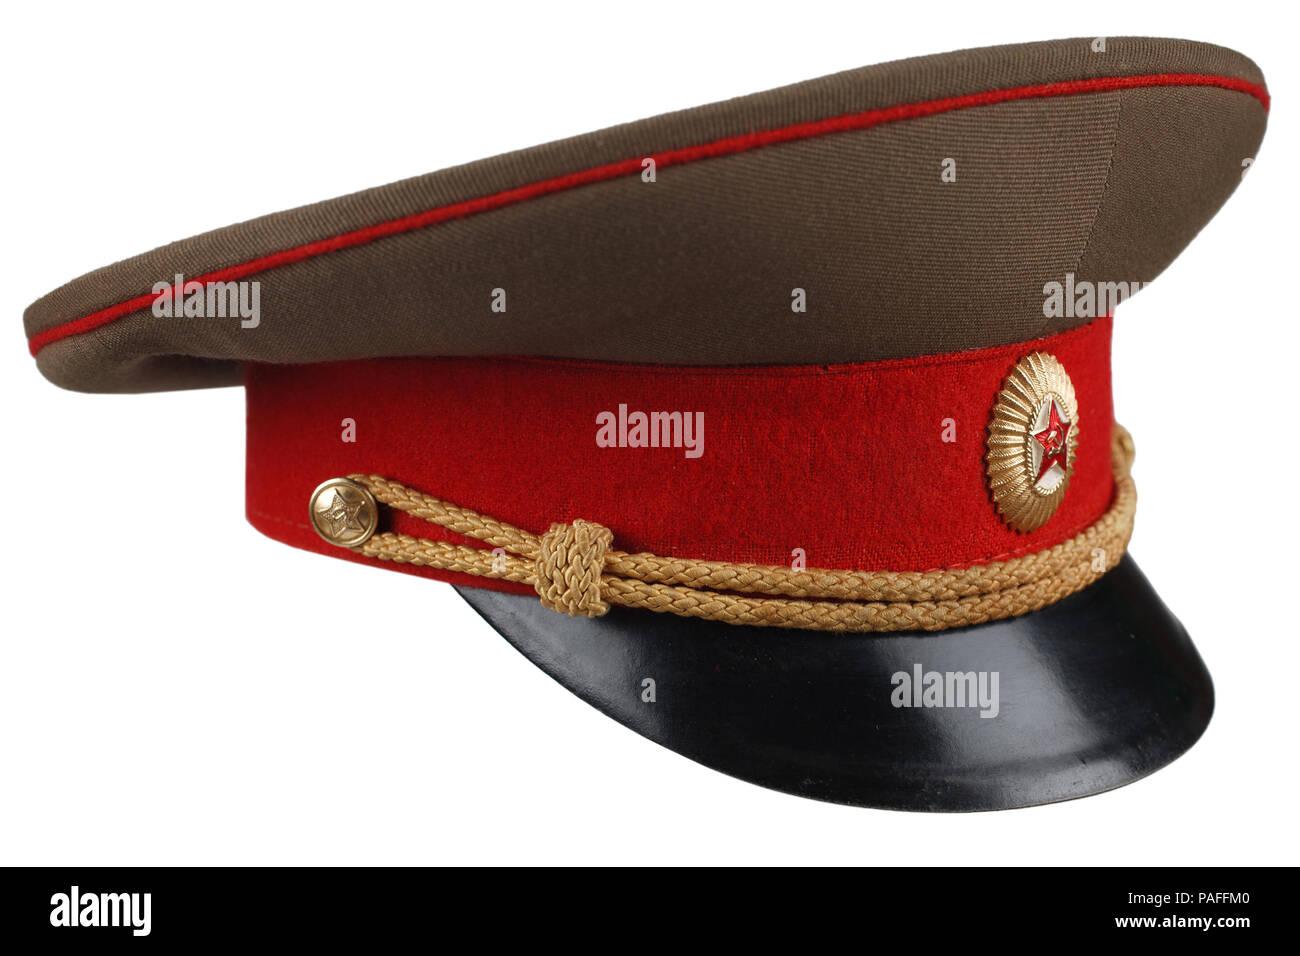 7b748302b3d6a Soviet Army officer cap isolated Stock Photo: 213012576 - Alamy